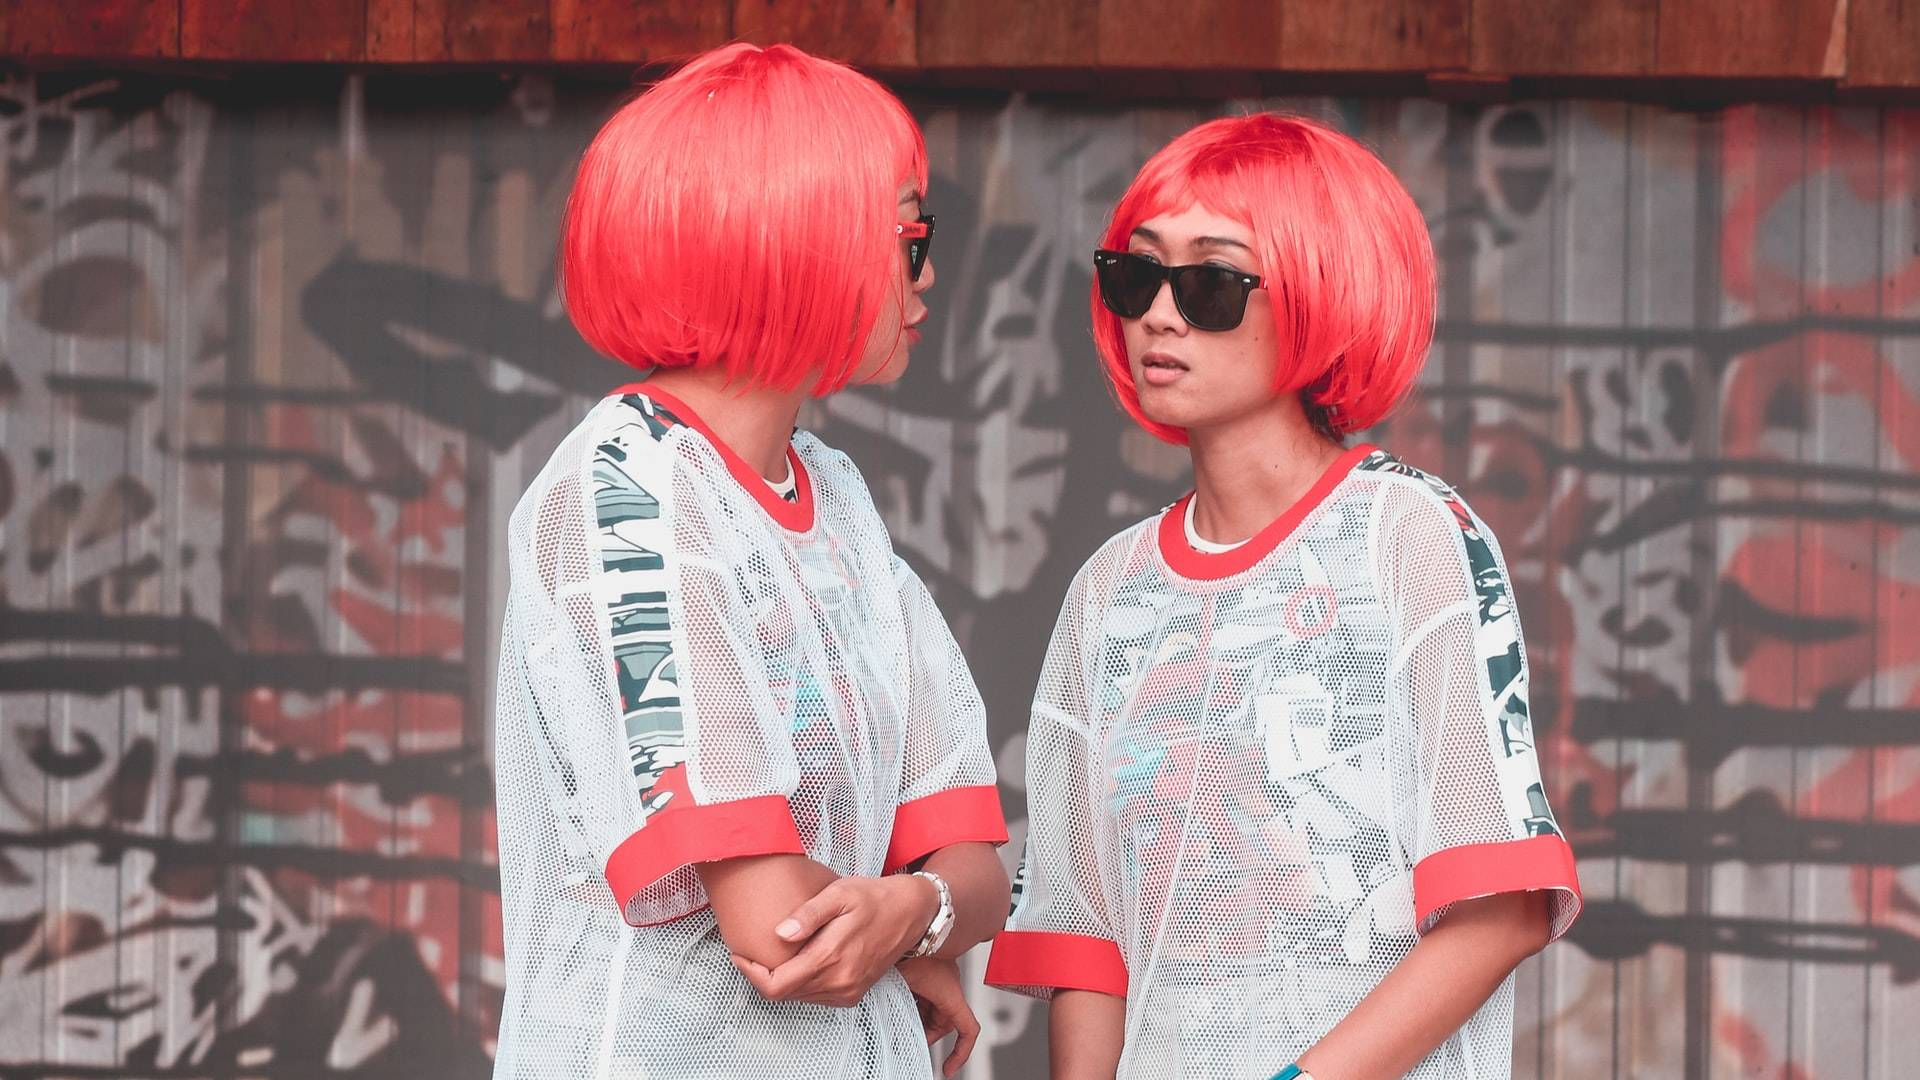 ikrek piros hajjal